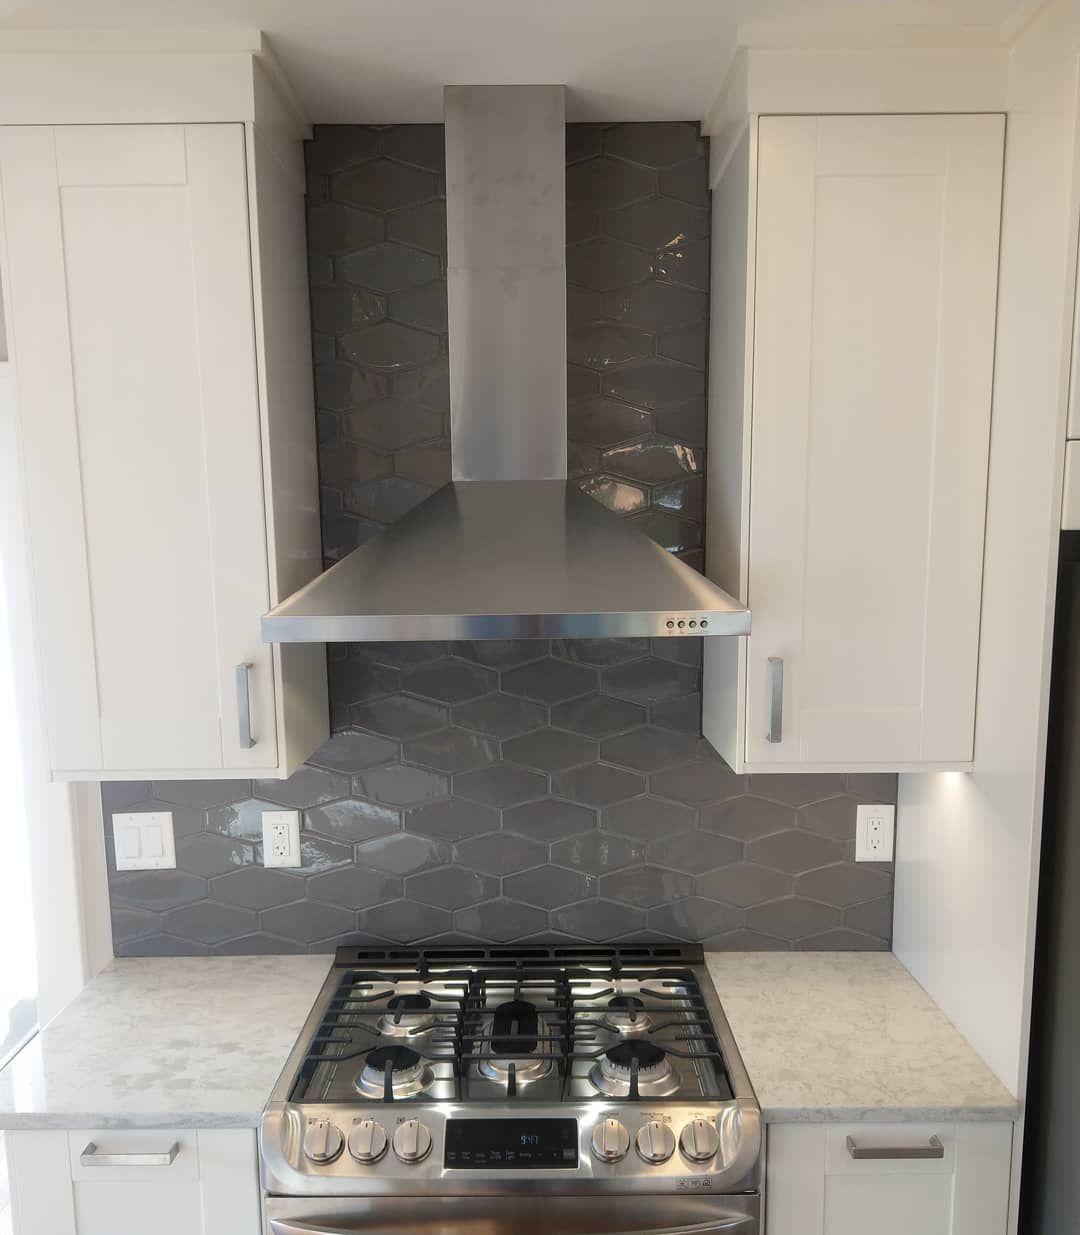 - Honey Comb Tile Backsplash, Ikea Shaker Style Cabinets, Quartz